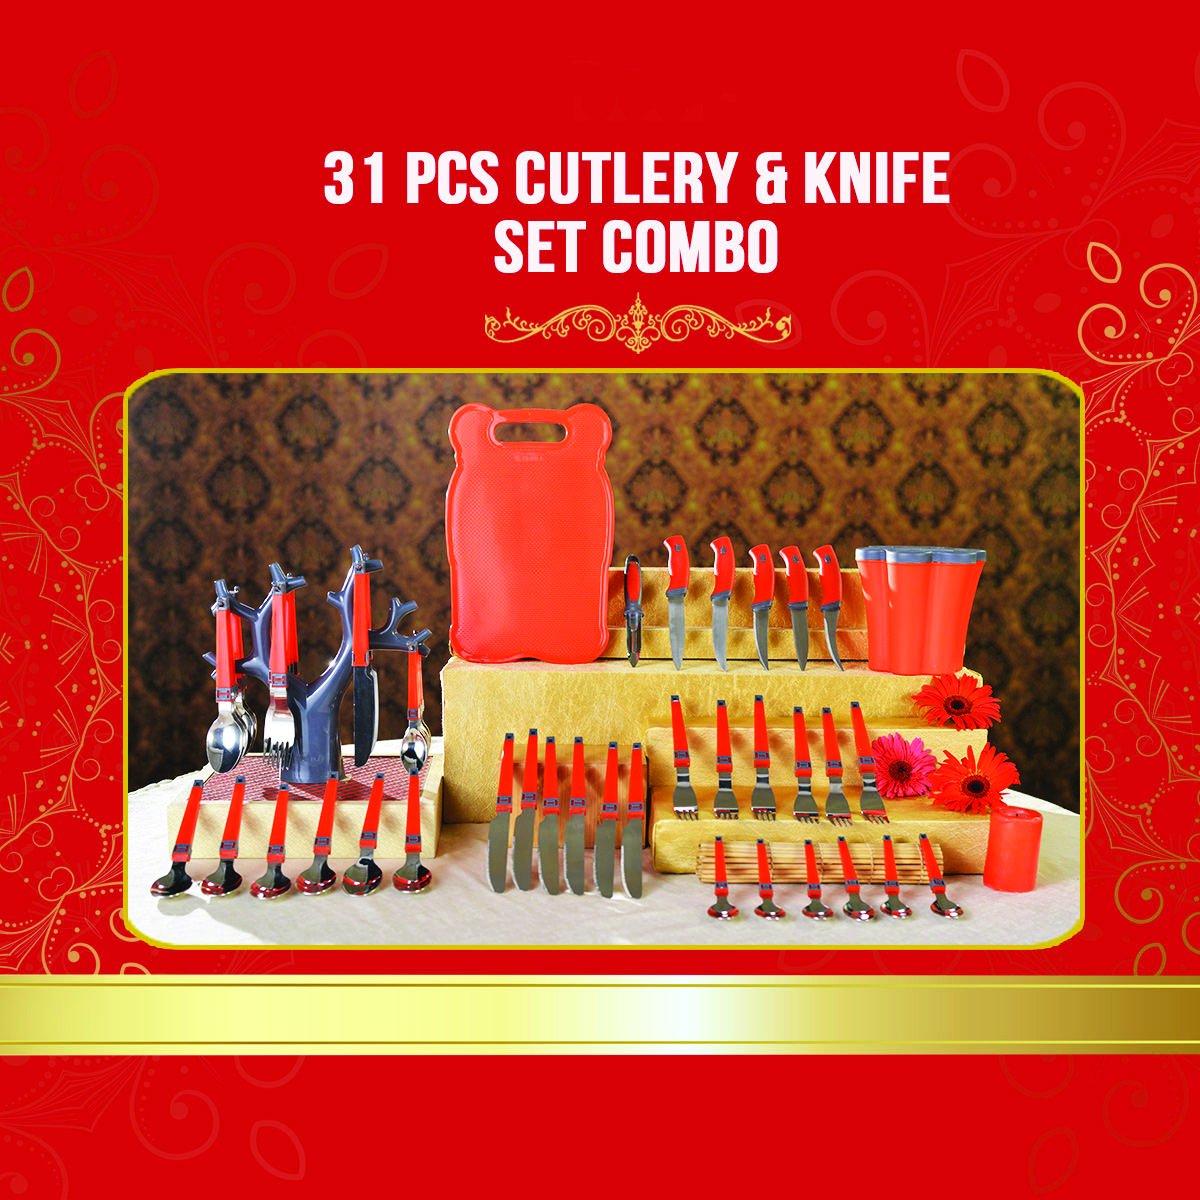 Kitchen Combo 31 Pcs Cutlery & Knife Set - Unnati Enterprises